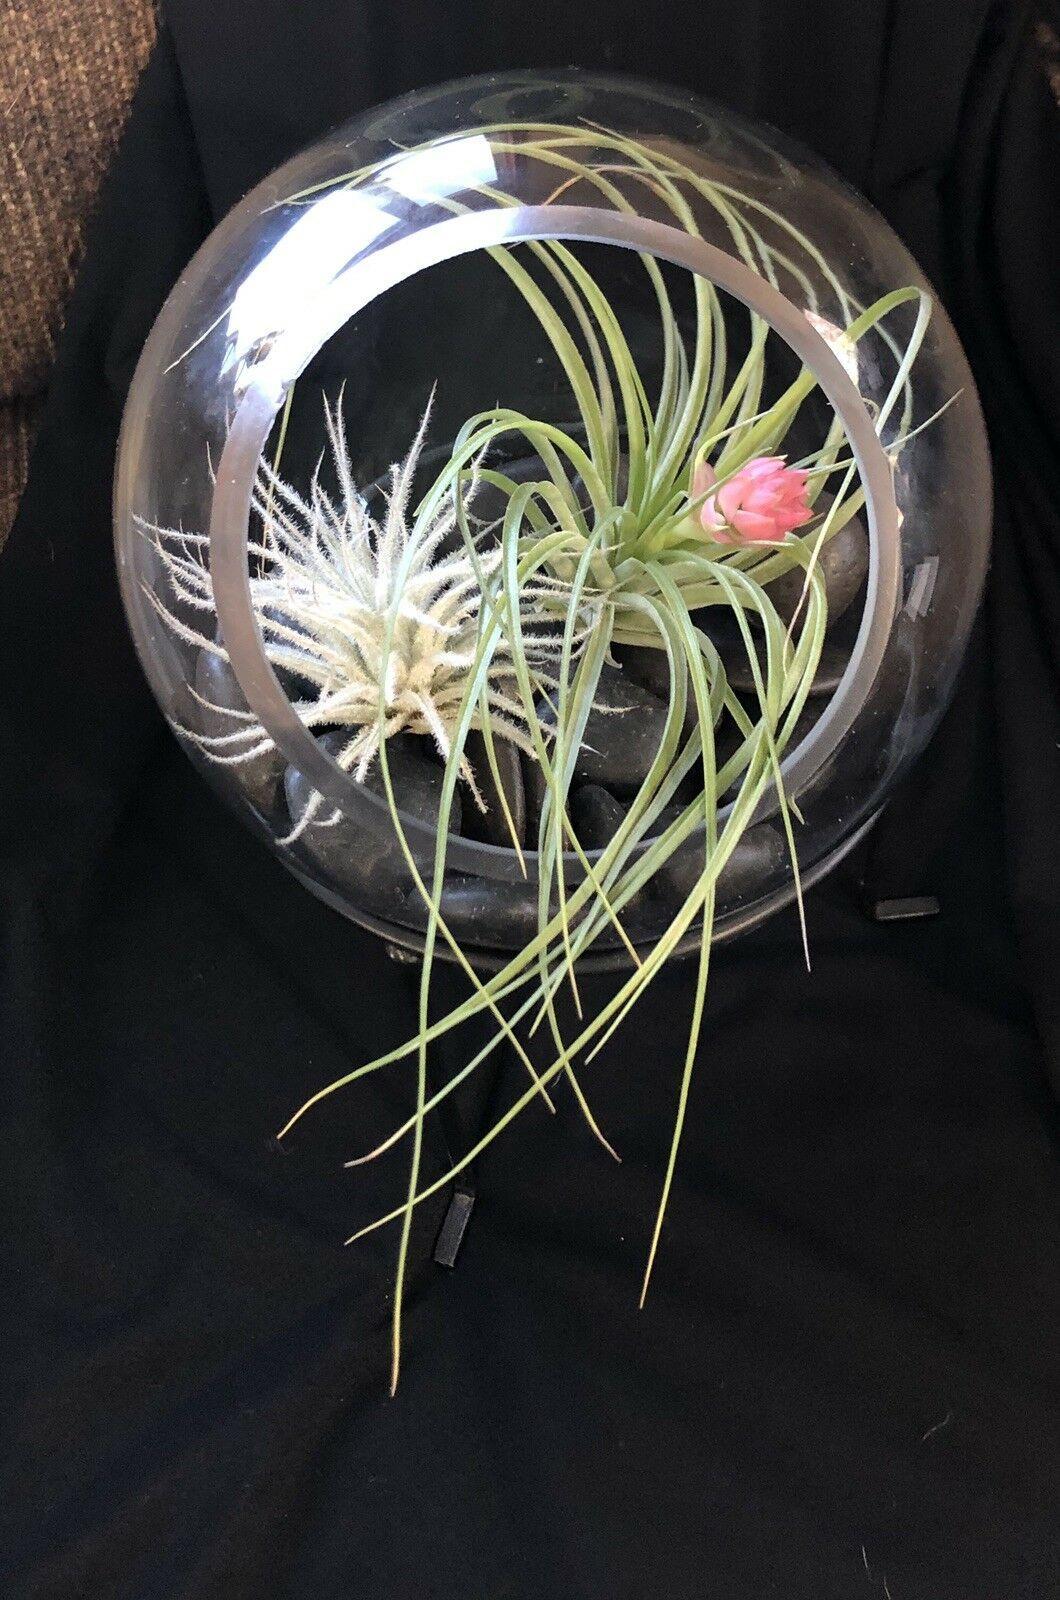 Spiral Iron Display Stand Glass Globe Airplant Terrarium